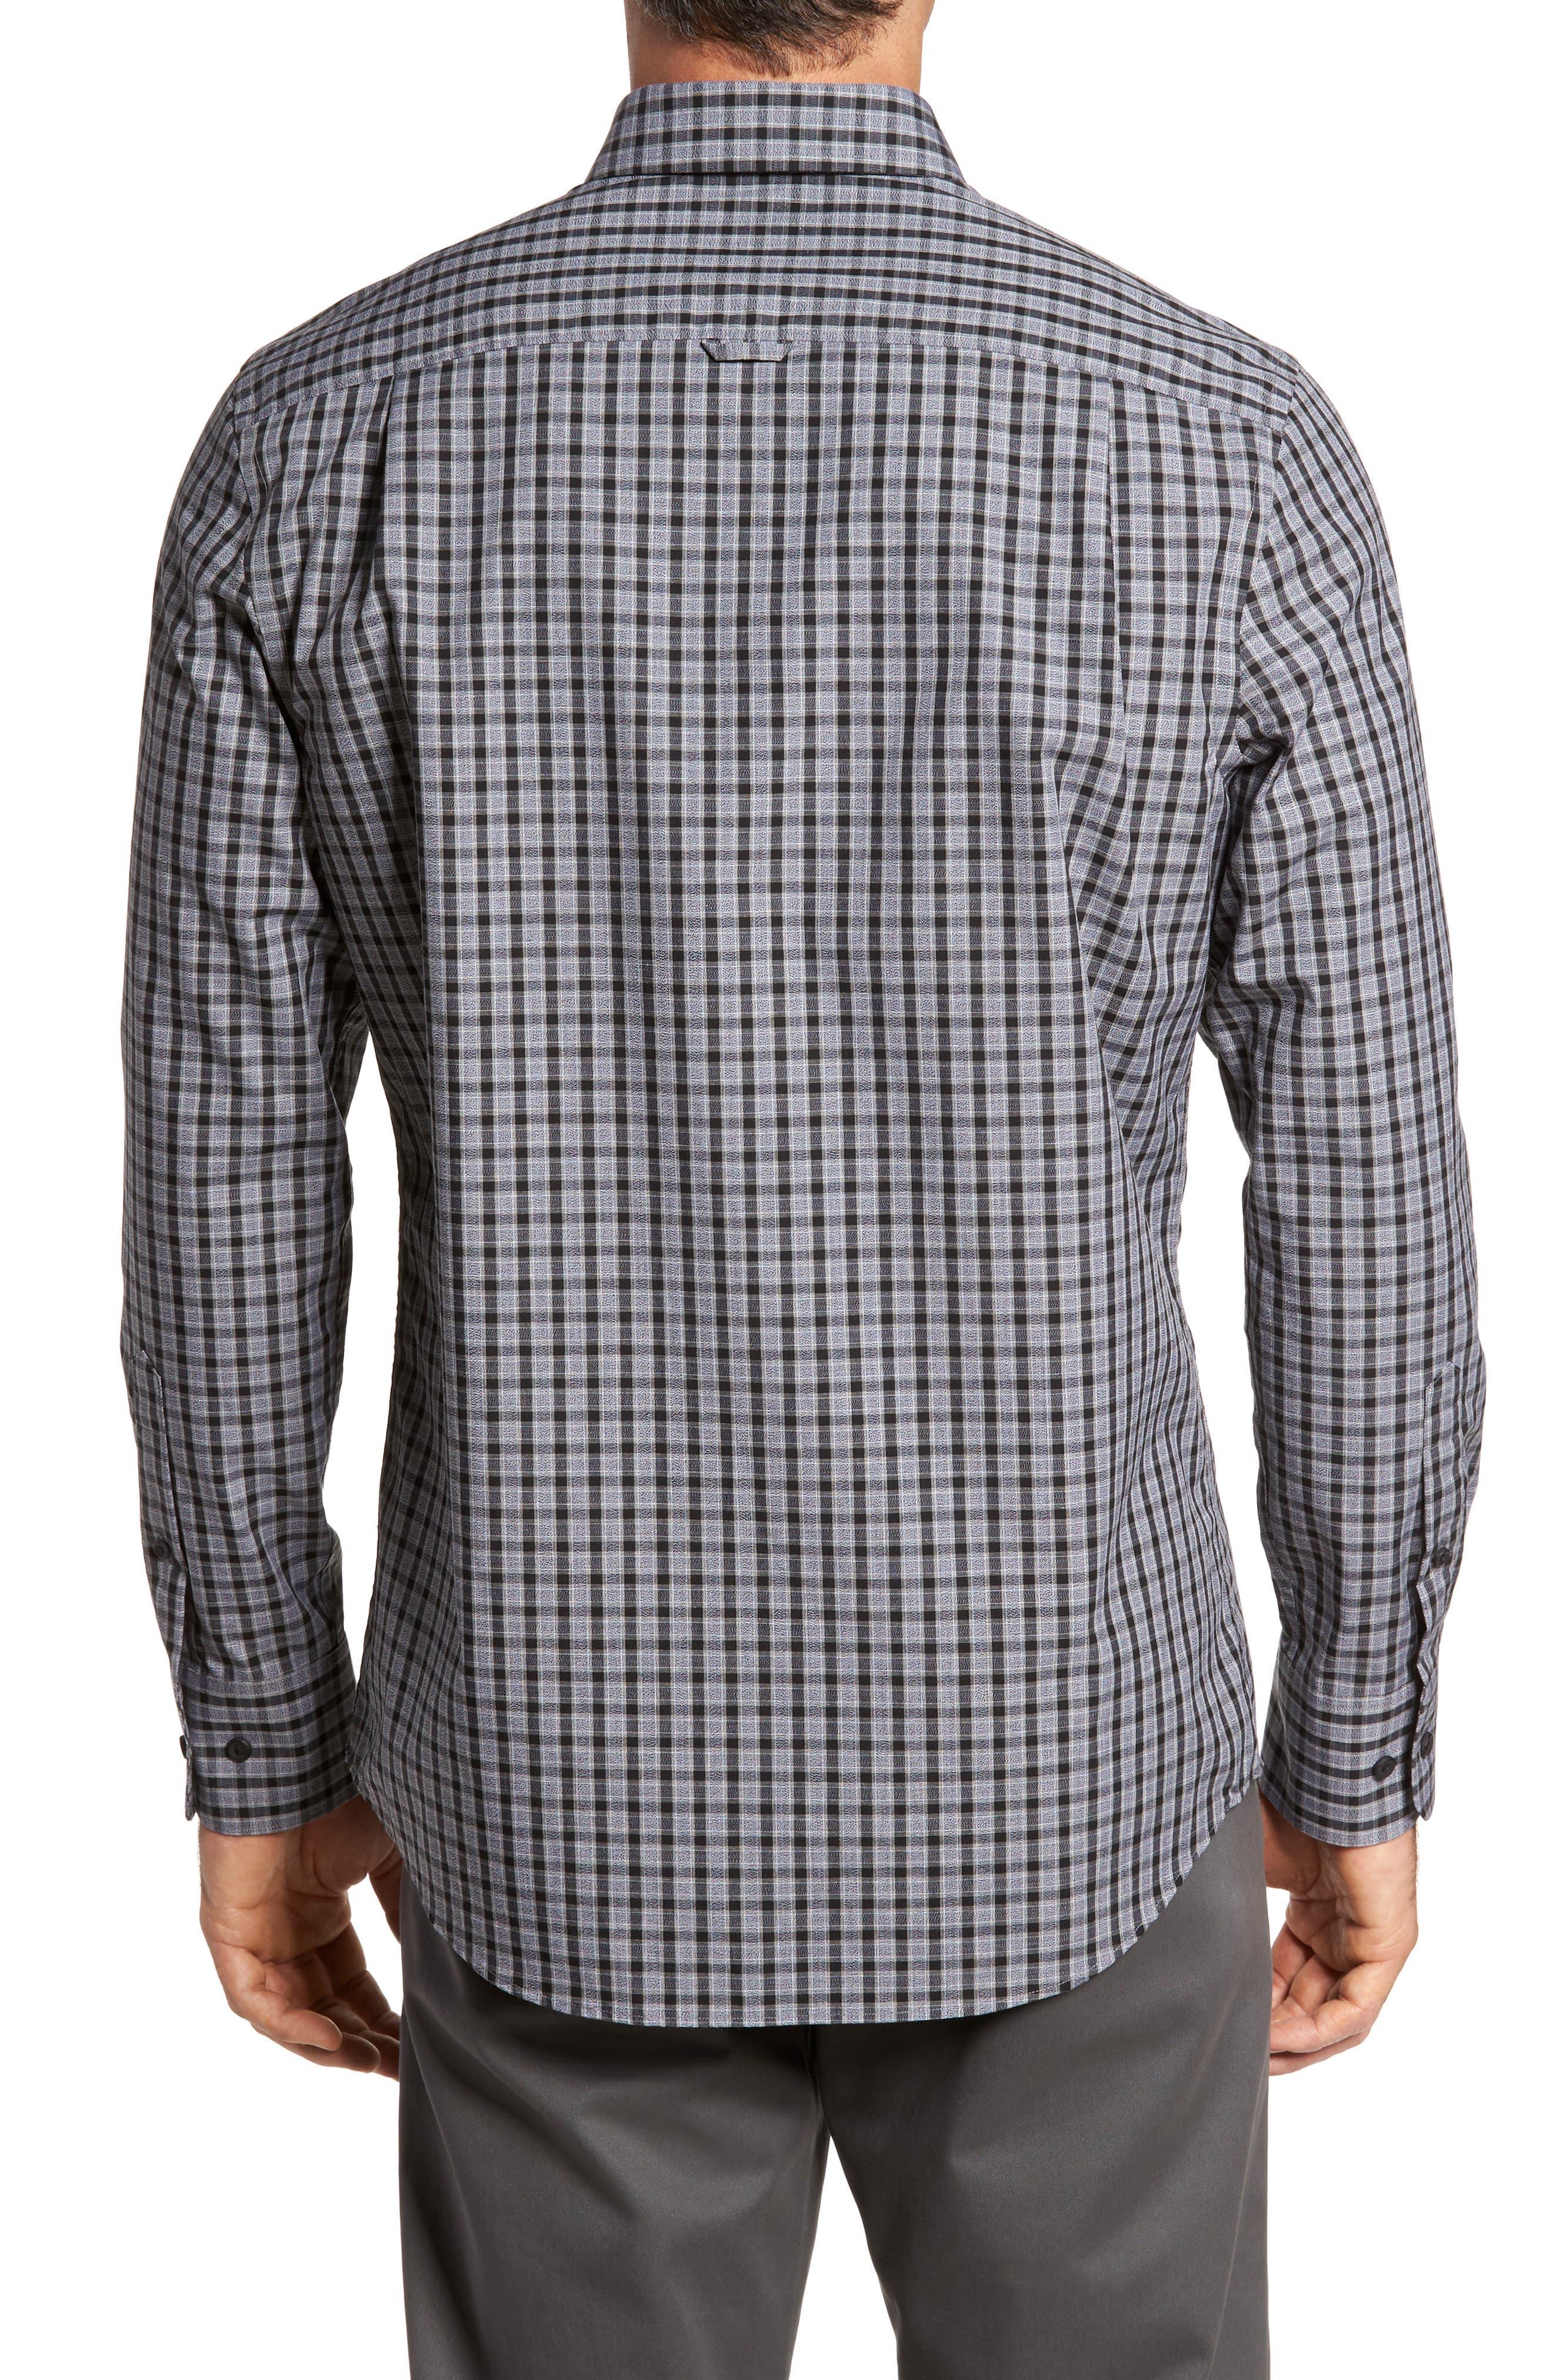 Regular Fit Non-Iron Check Sport Shirt,                             Alternate thumbnail 2, color,                             Grey Shade Black Heather Check